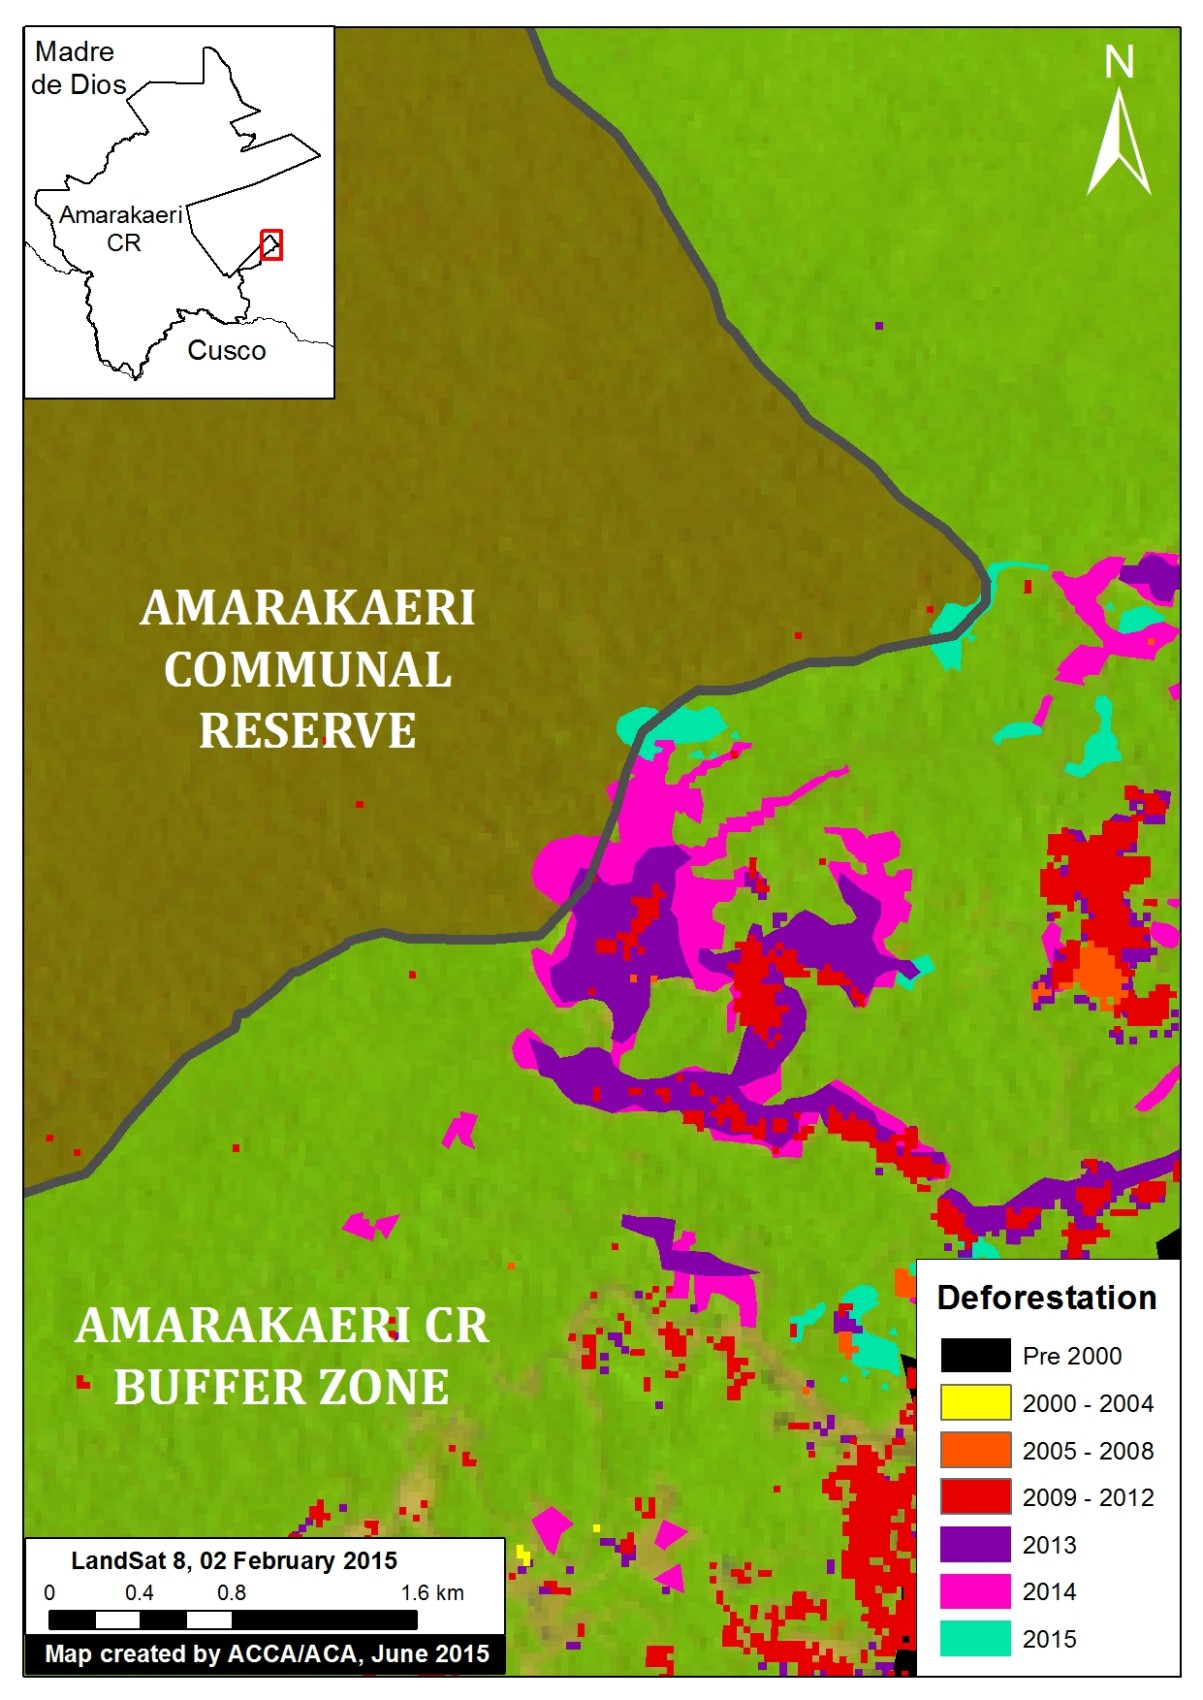 An enhanced view of the deforestation within the southeast section of Amarakaeri Communal Reserve and its surrounding buffer zone. Key data sources: MINAM, SERNANP, ACCA, Hansen/UMD/Google/USGS/NASA, USGS.